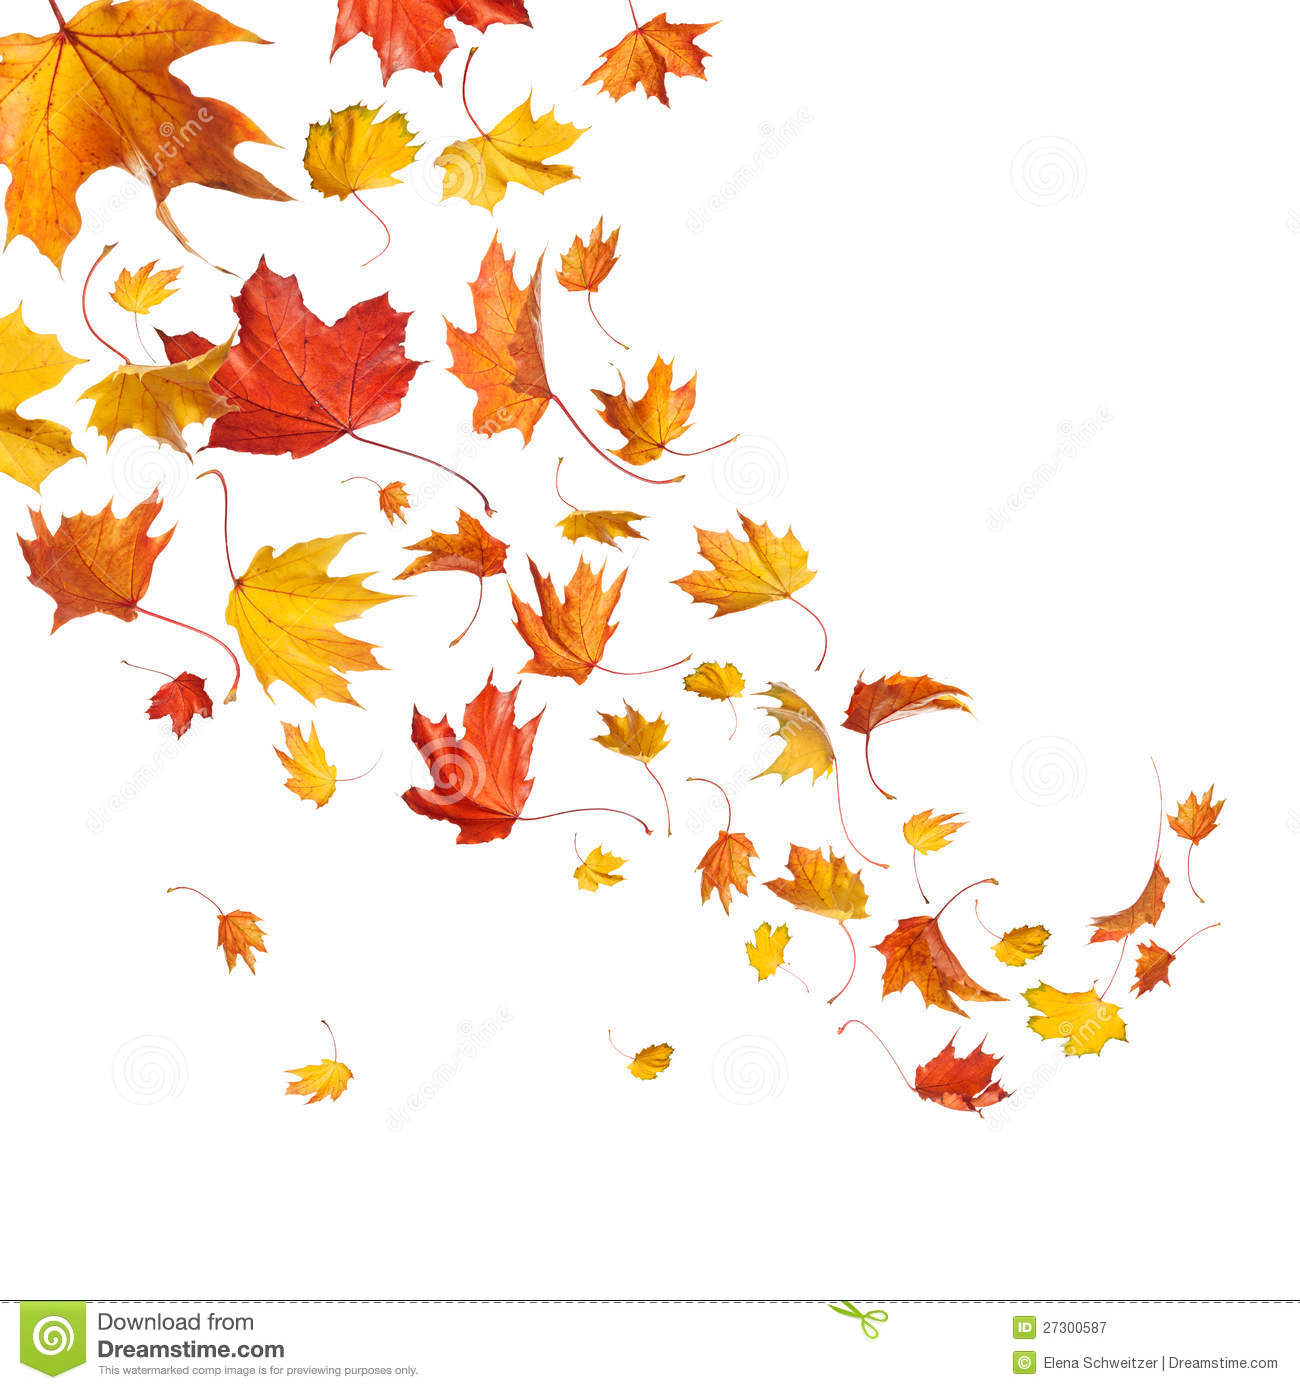 Image result for falling leaves